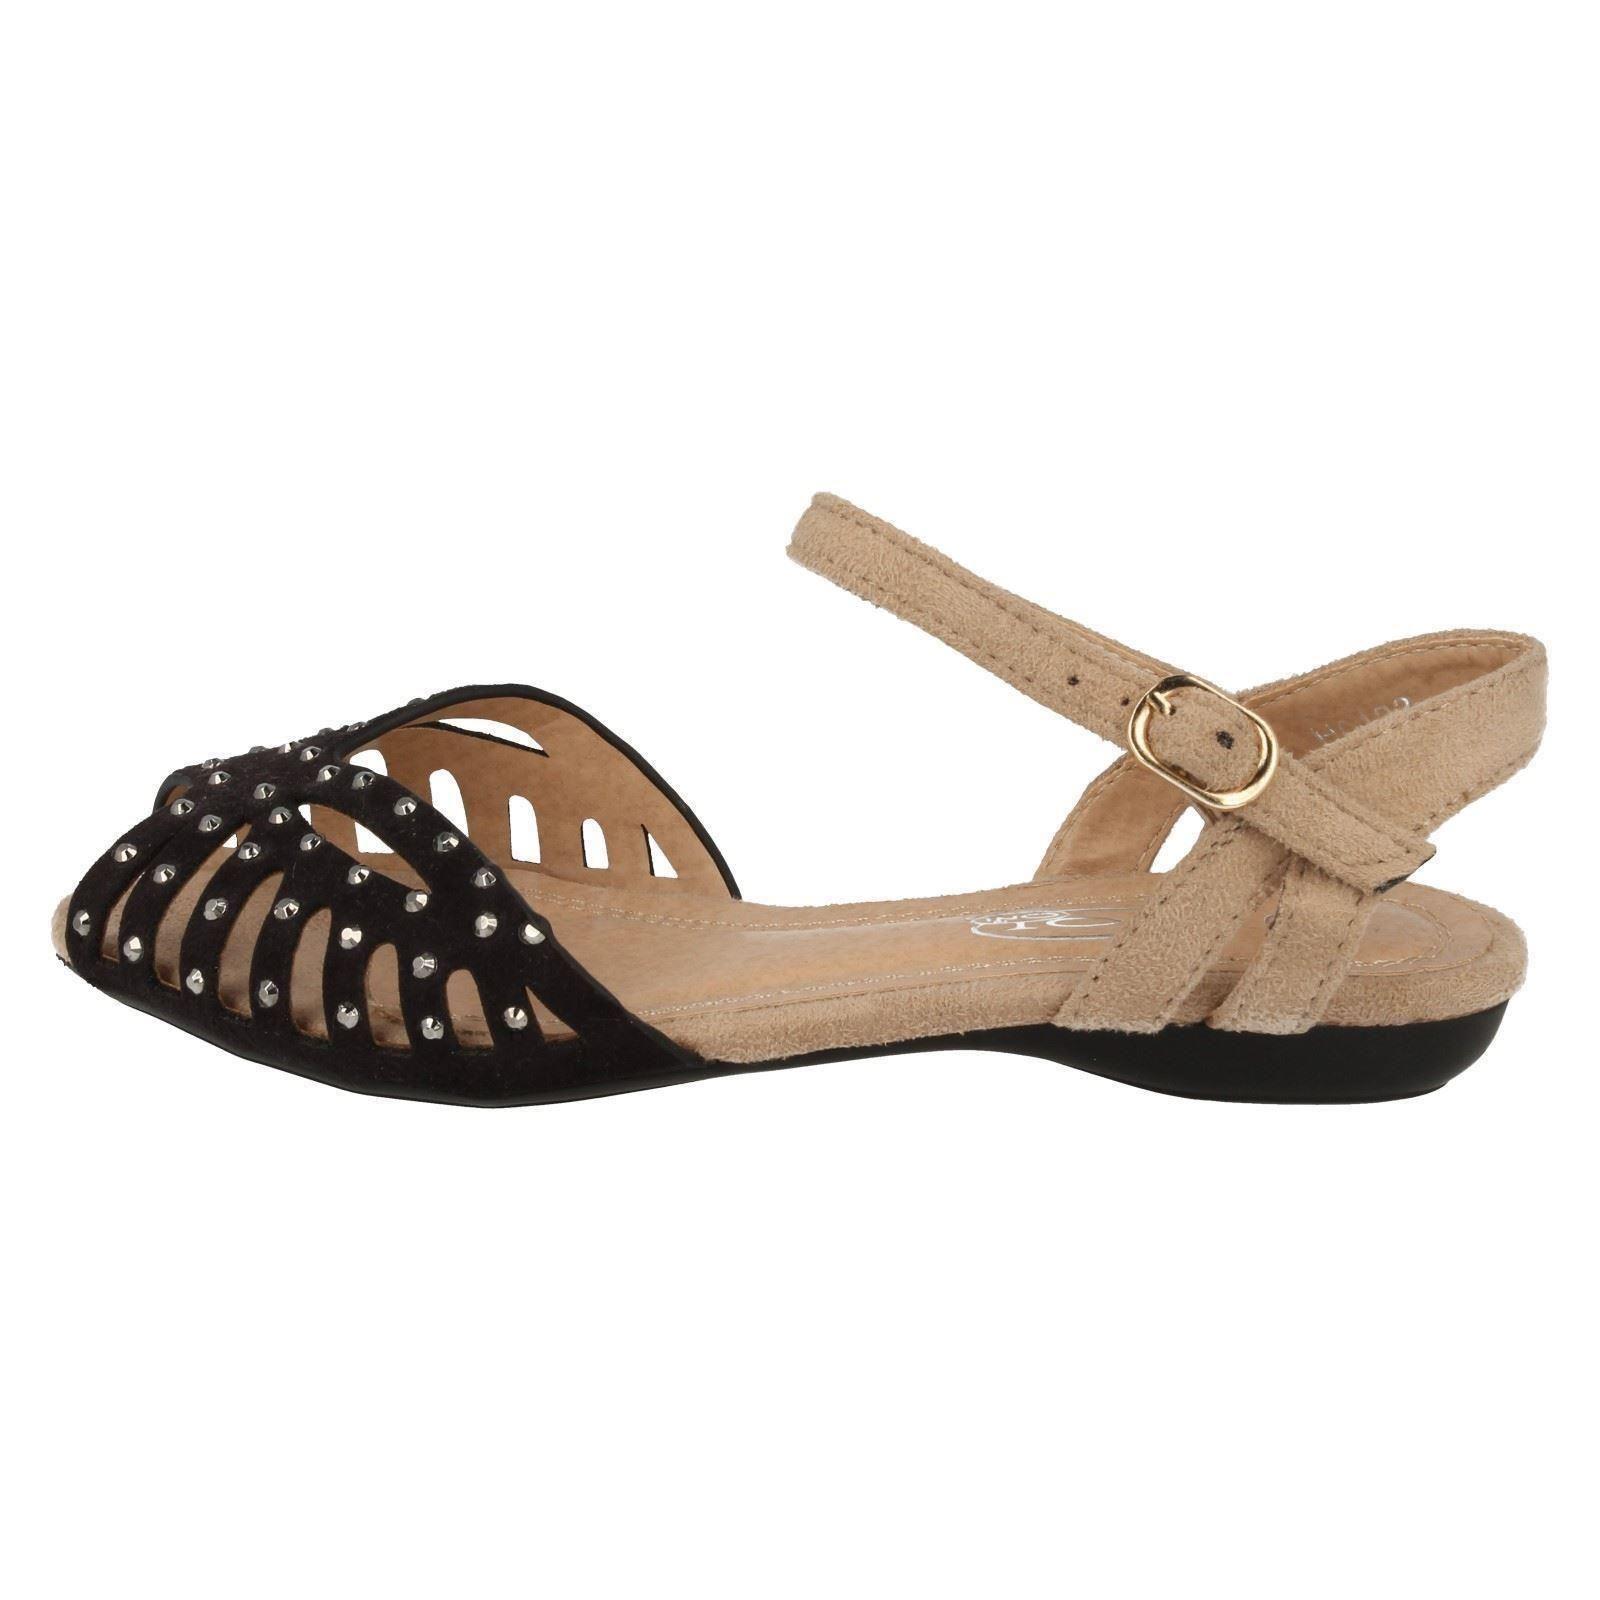 Niñas Spot on Peep Toe Sandalias Etiqueta H0123-D